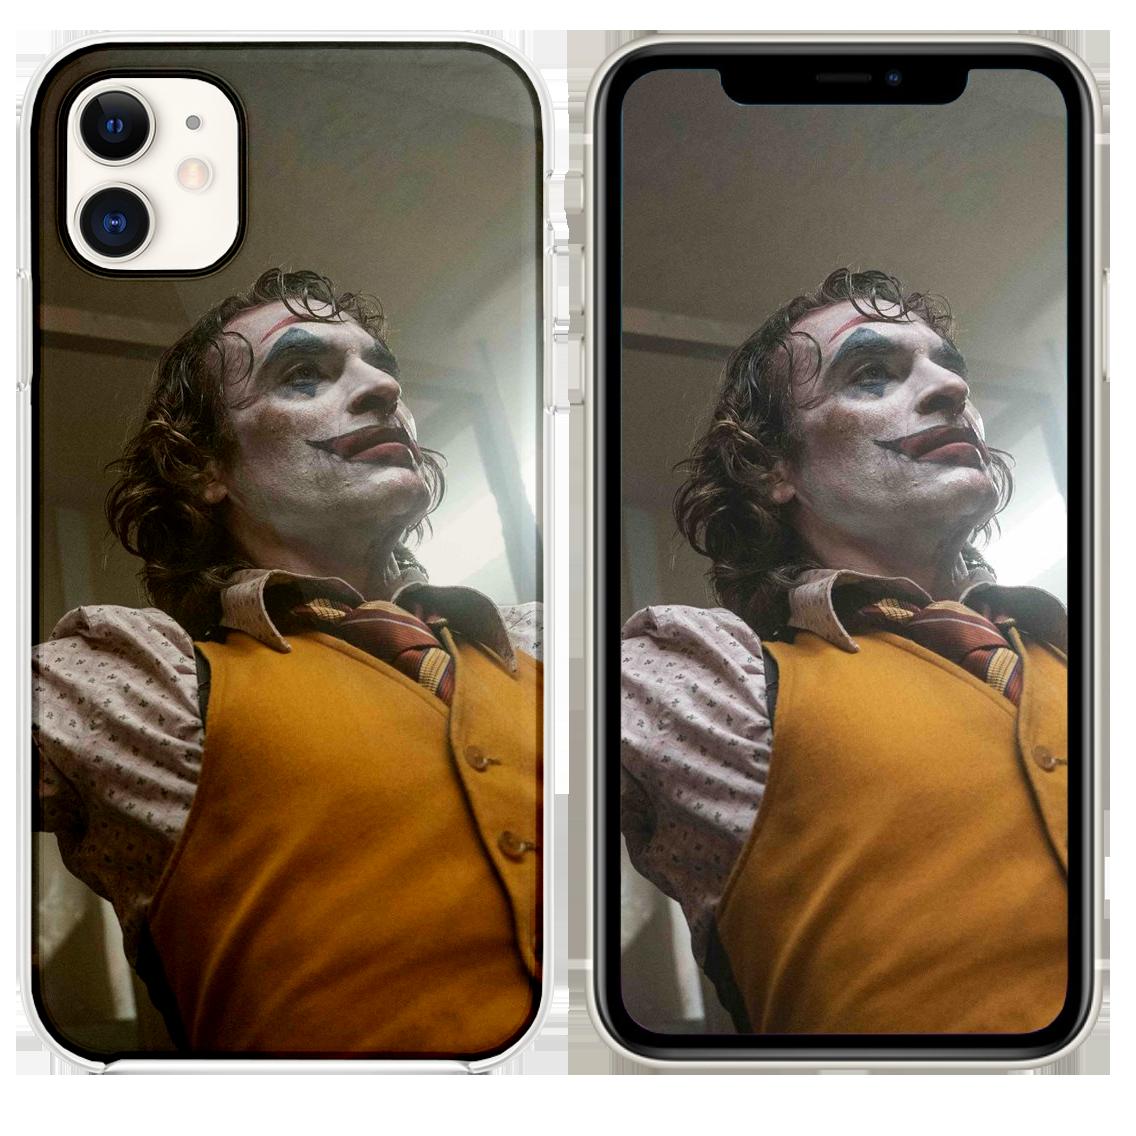 The Joker Joaquin Phoenix 5k 2019 Iphone 11 Case And Wallpaper Joker Joaquin Phoenix Iphone 11